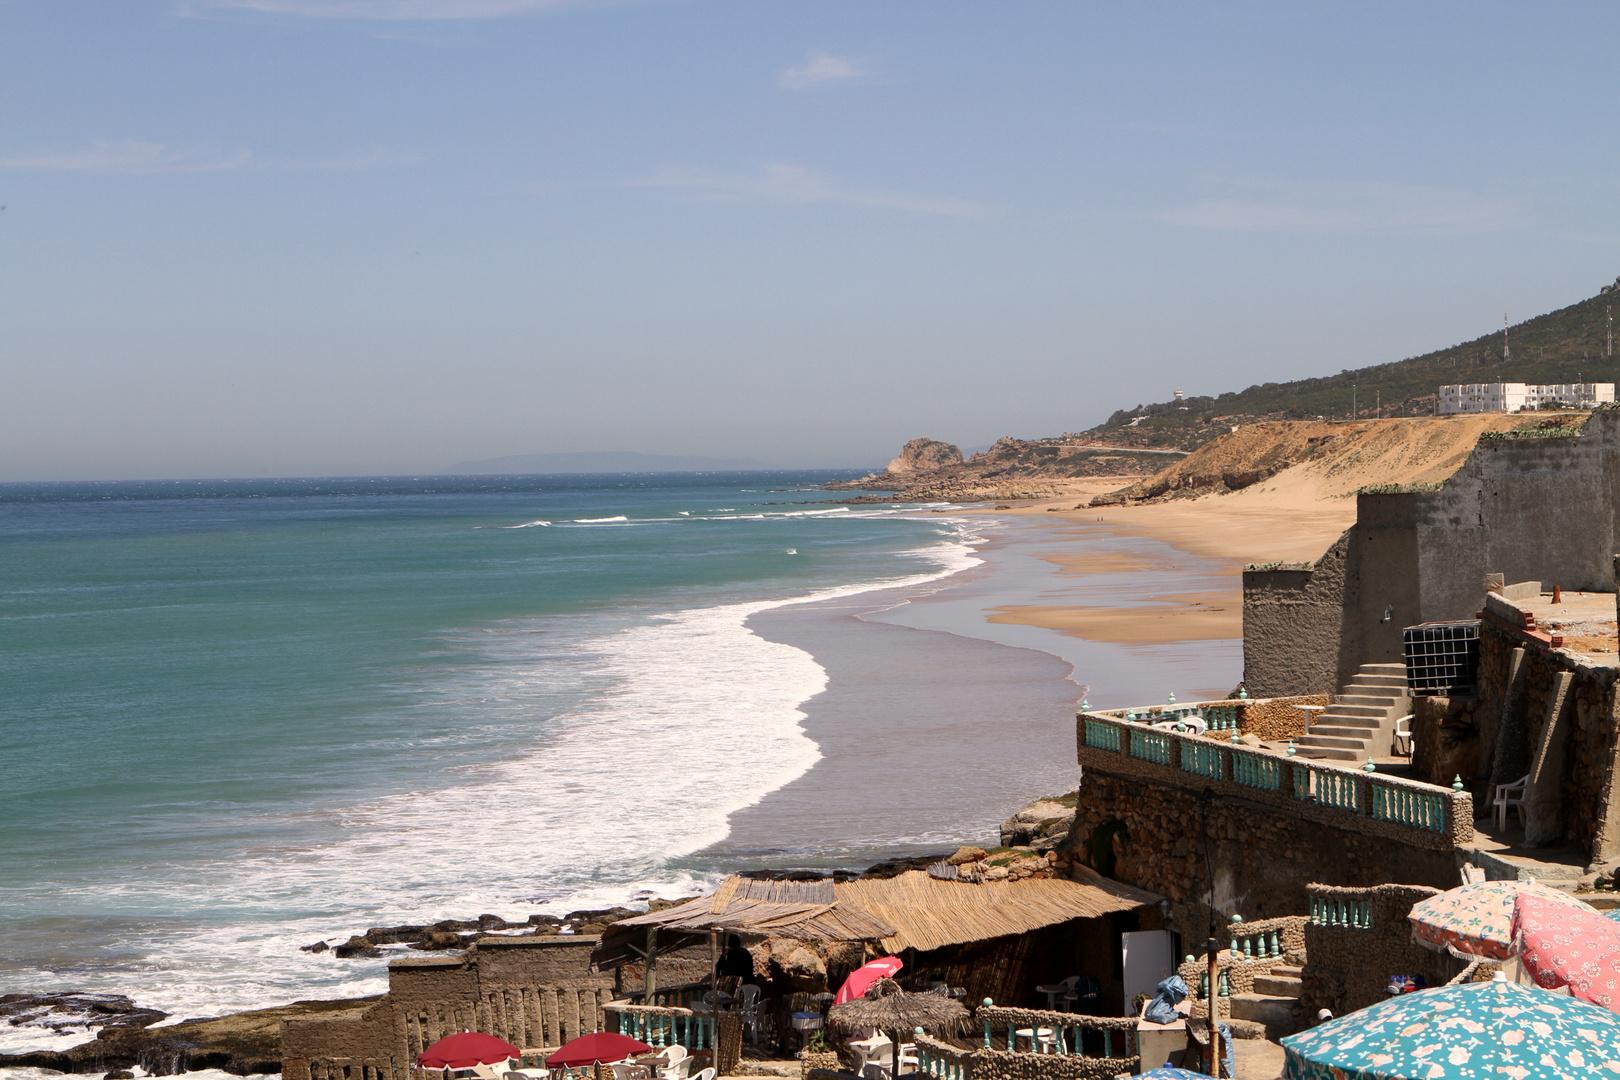 Blick auf den Strand - Küste in Tanger